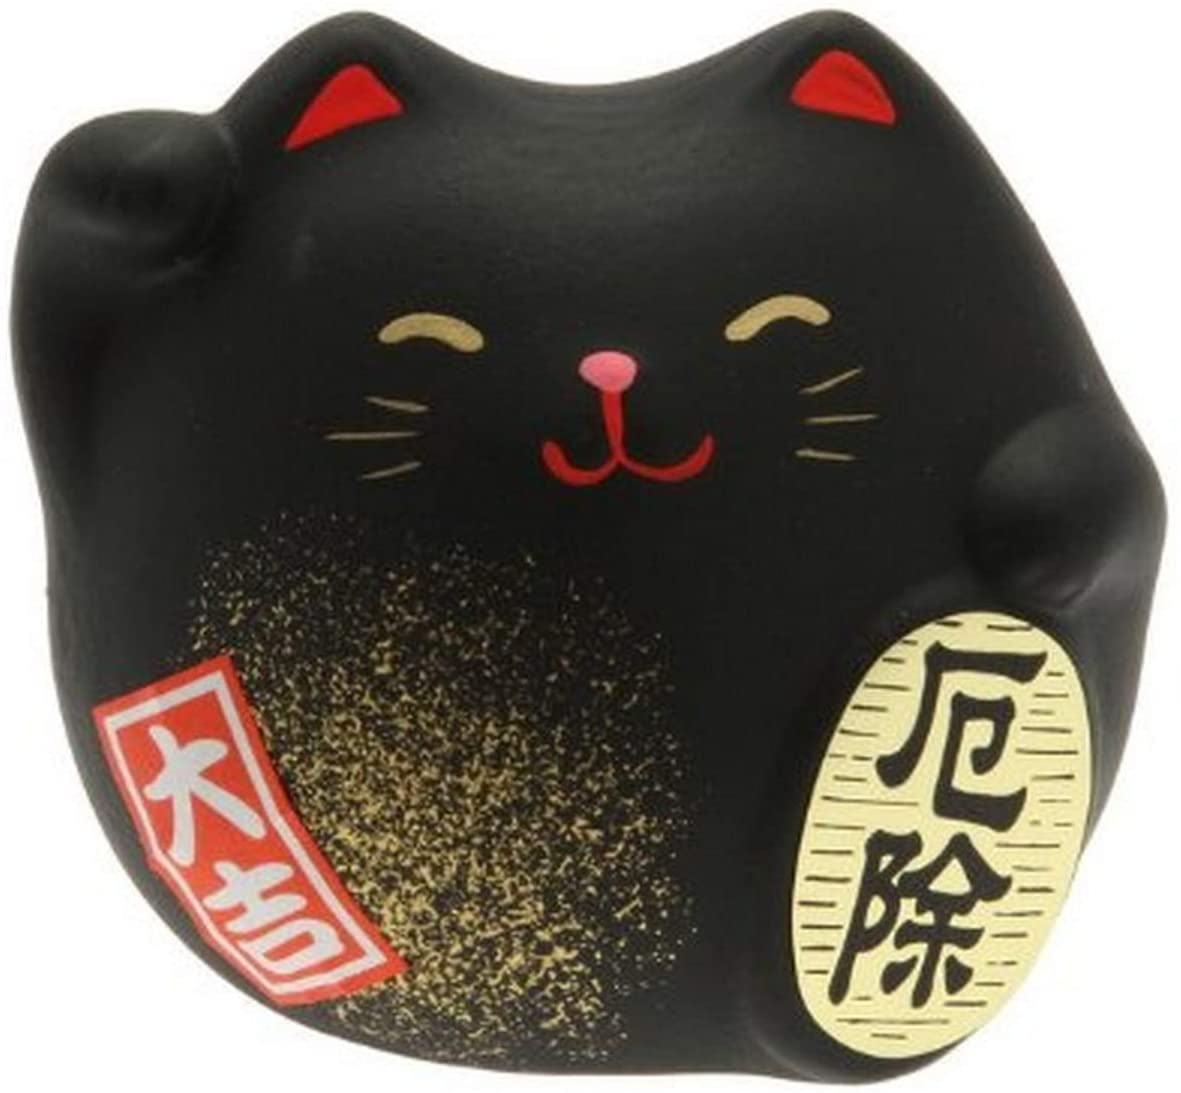 Kotobuki Maneki Neko Charm Yakuyoke-un - traditional souvenirs from Japan